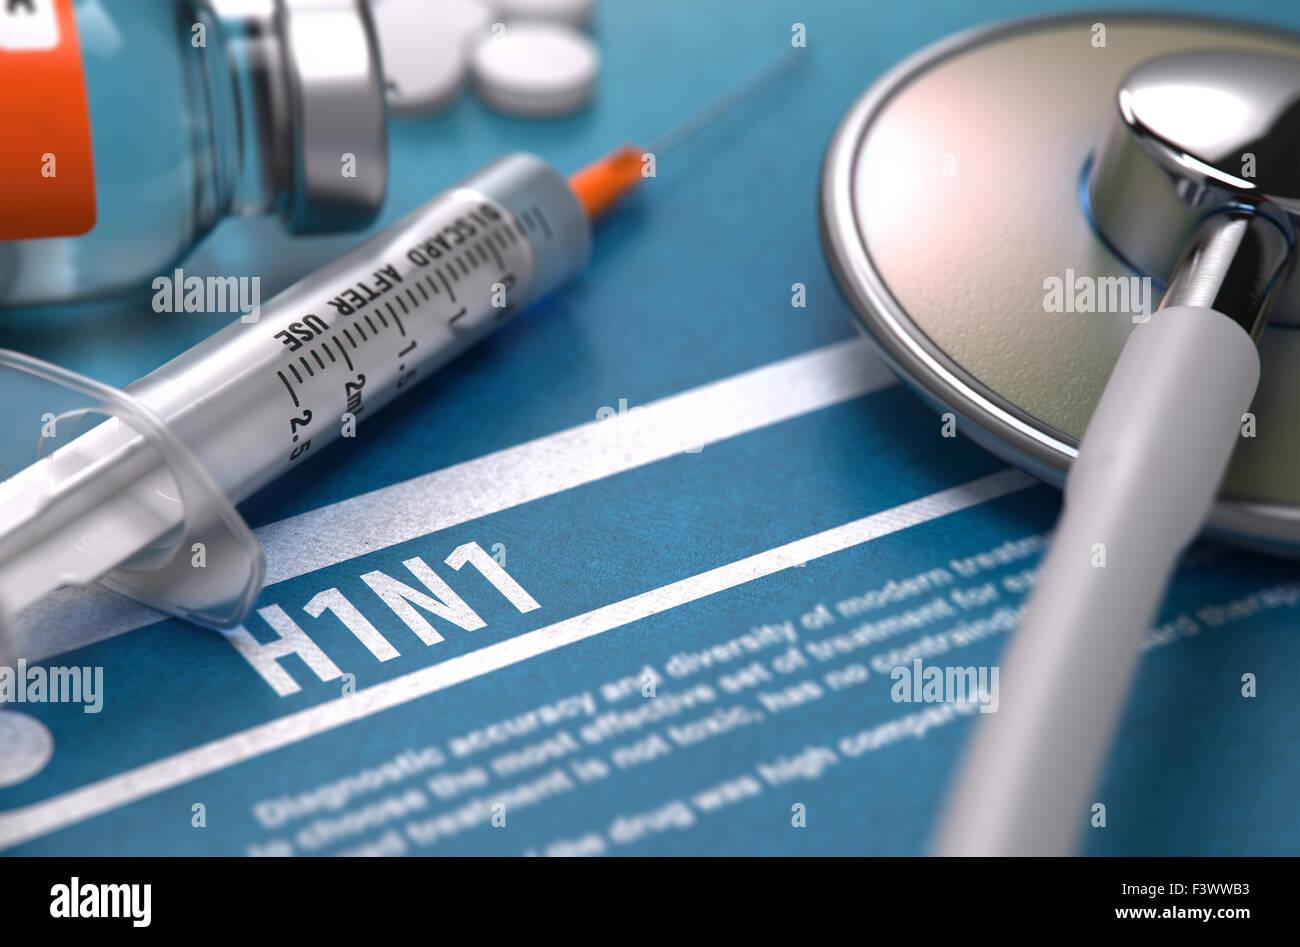 H1N1. Medical Concept on Blue Background. - Stock Image